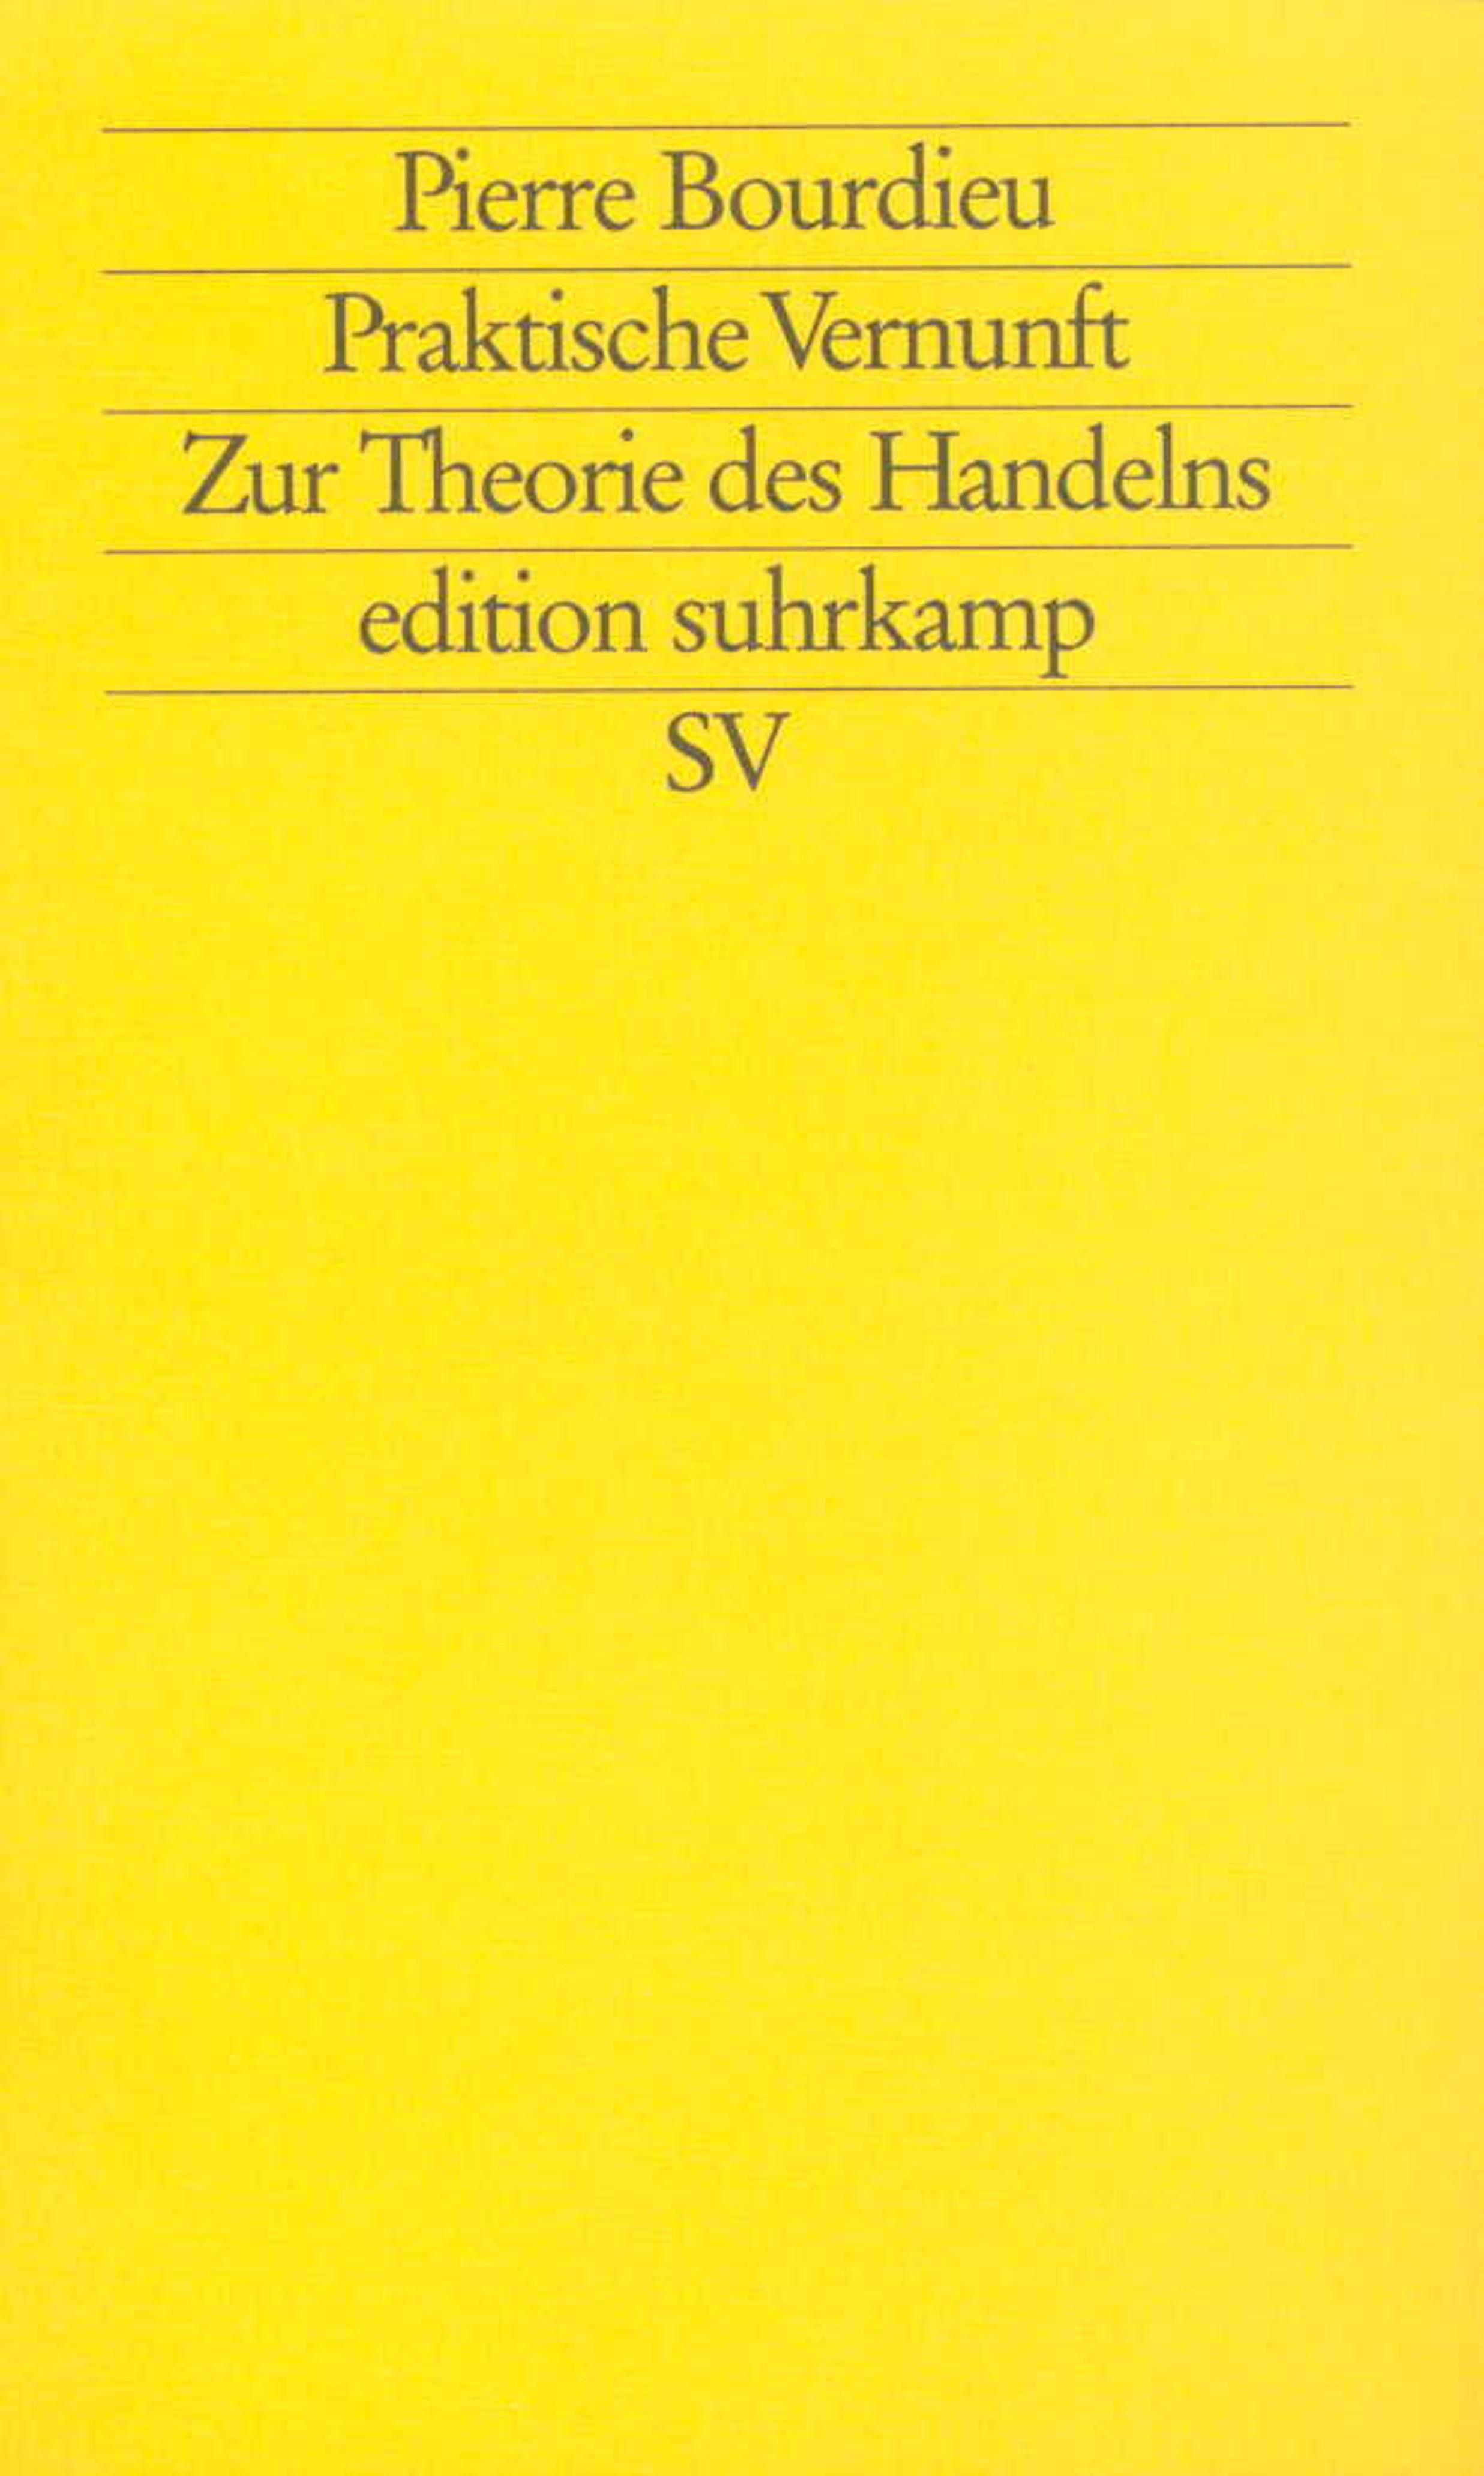 Praktische Vernunft | Bourdieu, 2012 | Buch (Cover)